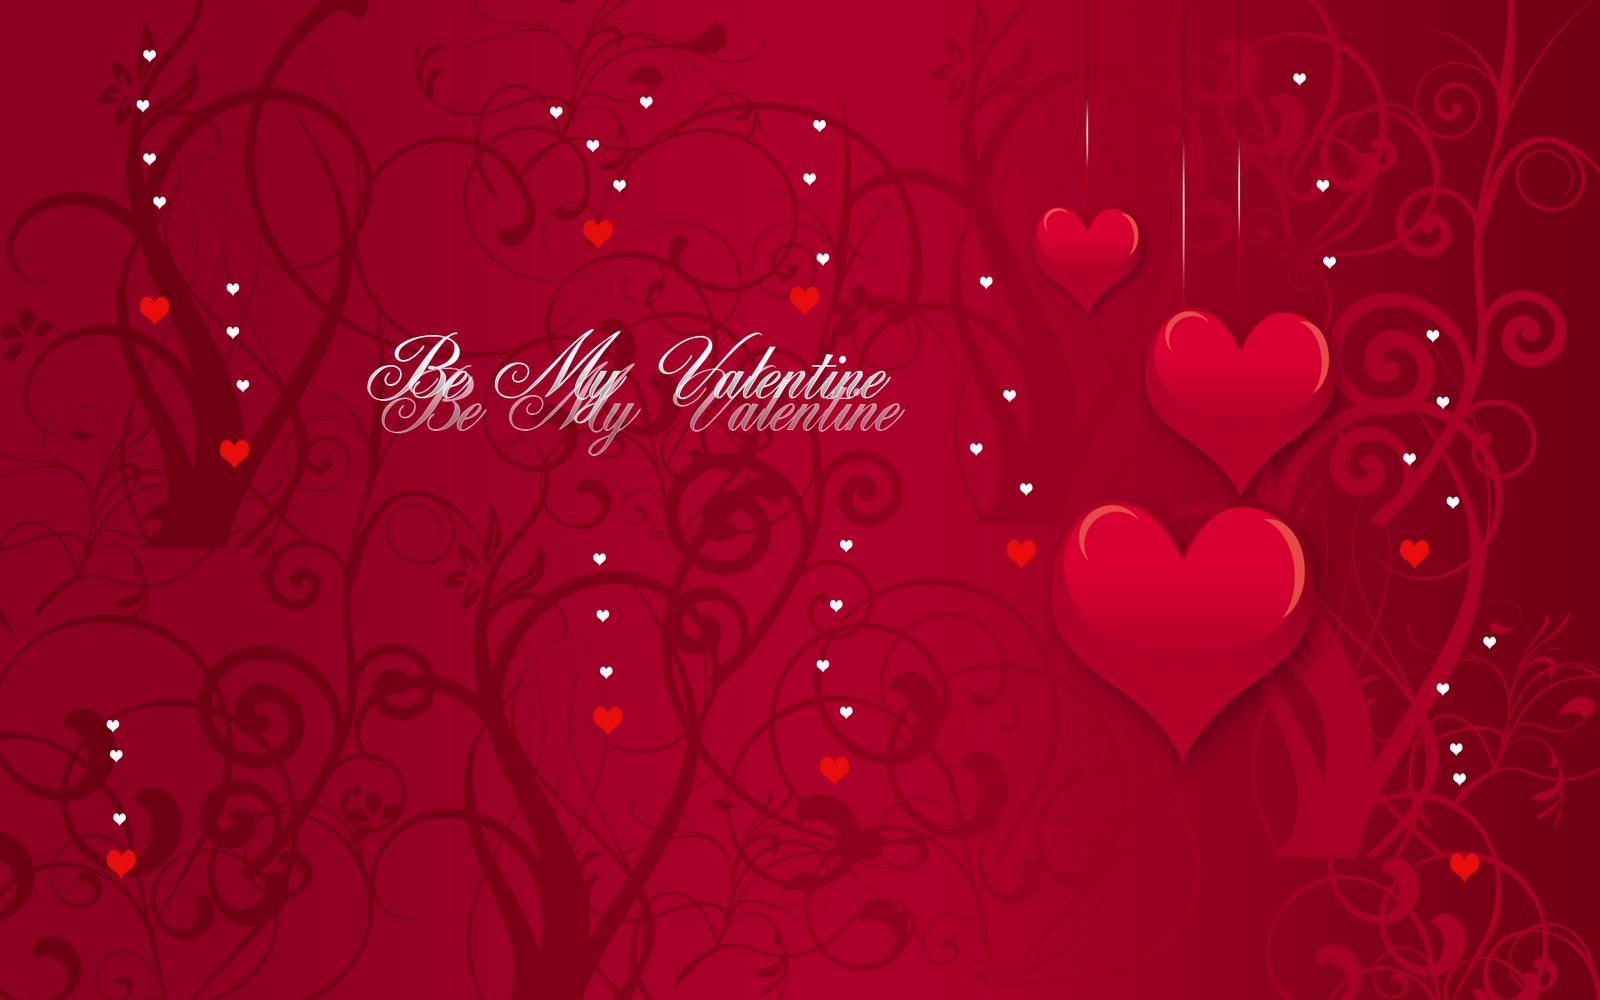 valentines day background wallpaper - photo #9